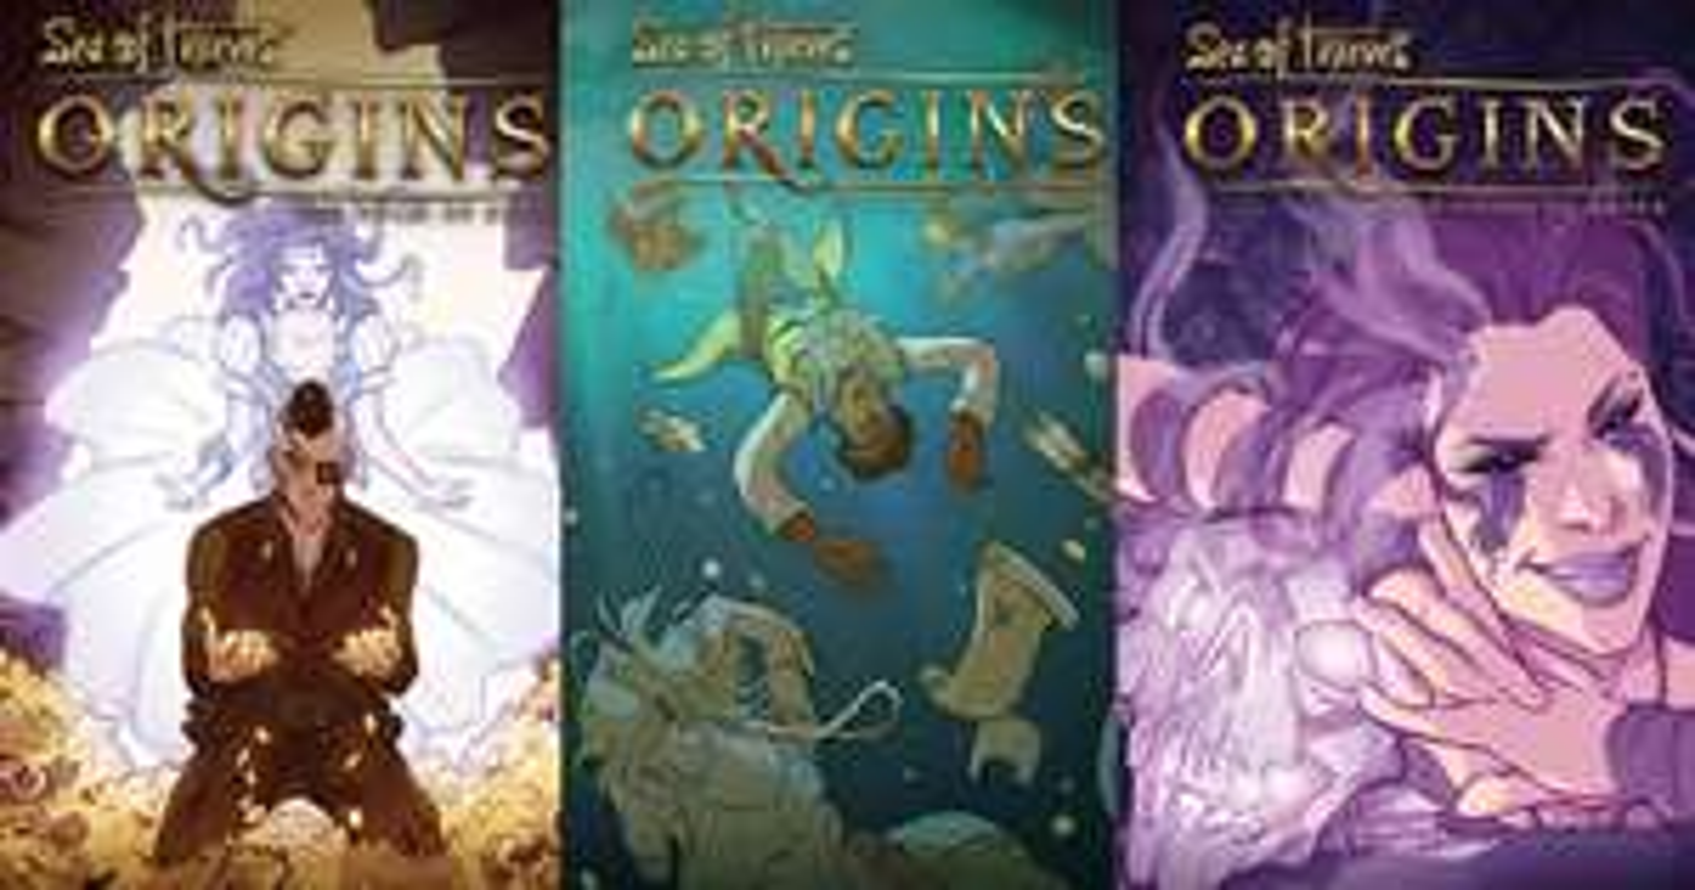 [Comixology/Amazon] Gratis 3 Sea of Thieves Comics